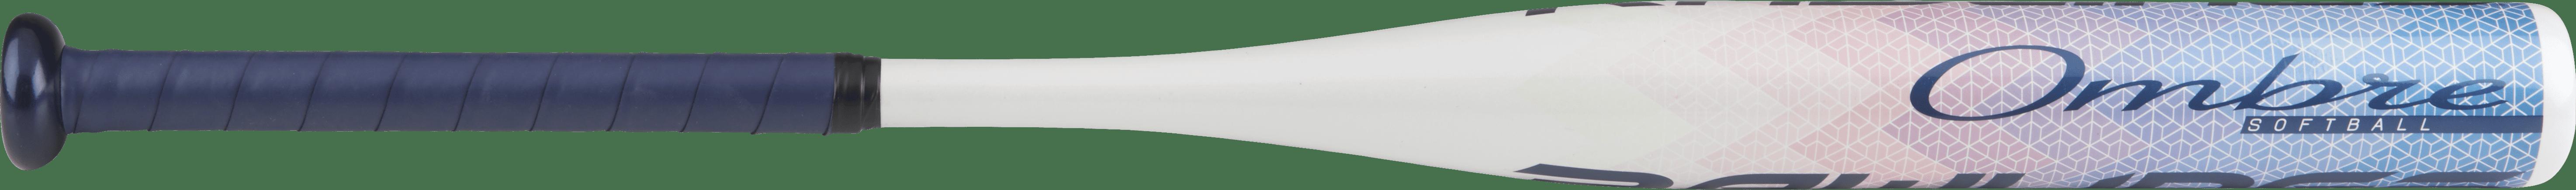 Rawlings Ombre Alloy Softball Bat, 2-1/4-Inch X-Tended Sweet Spot Barrel, 29-Inch Length,...